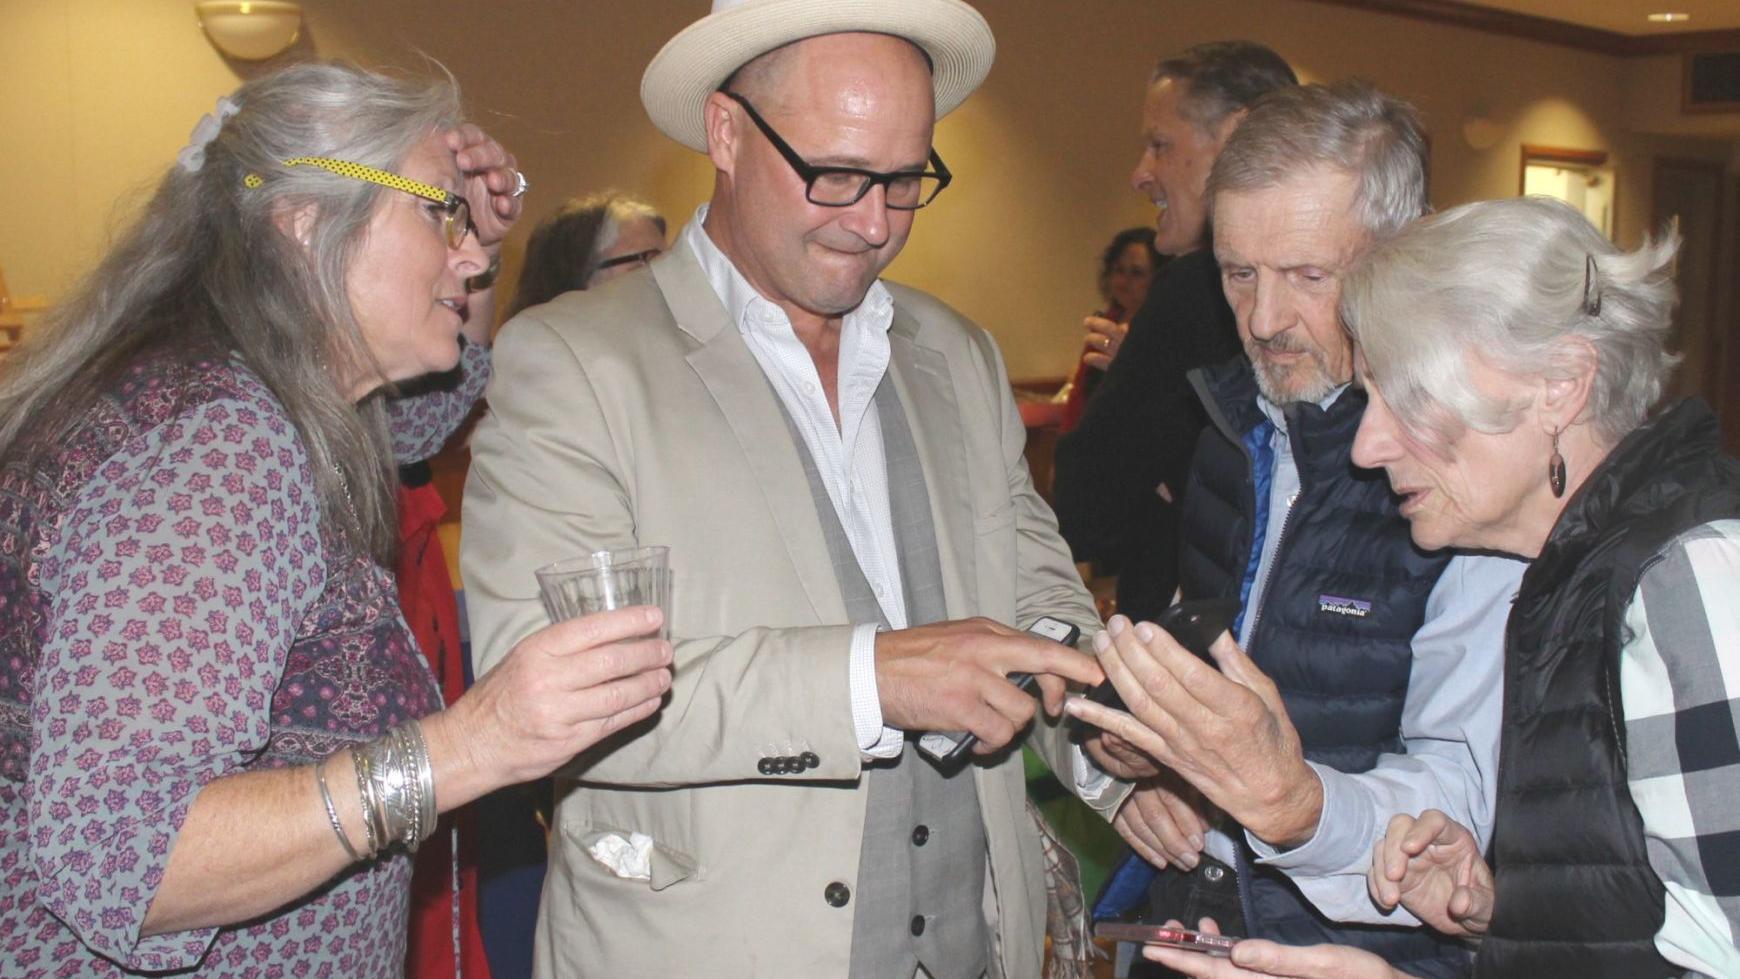 St. Helena Mayor Geoff Ellsworth spent $117,284.40 on November mayoral campaign